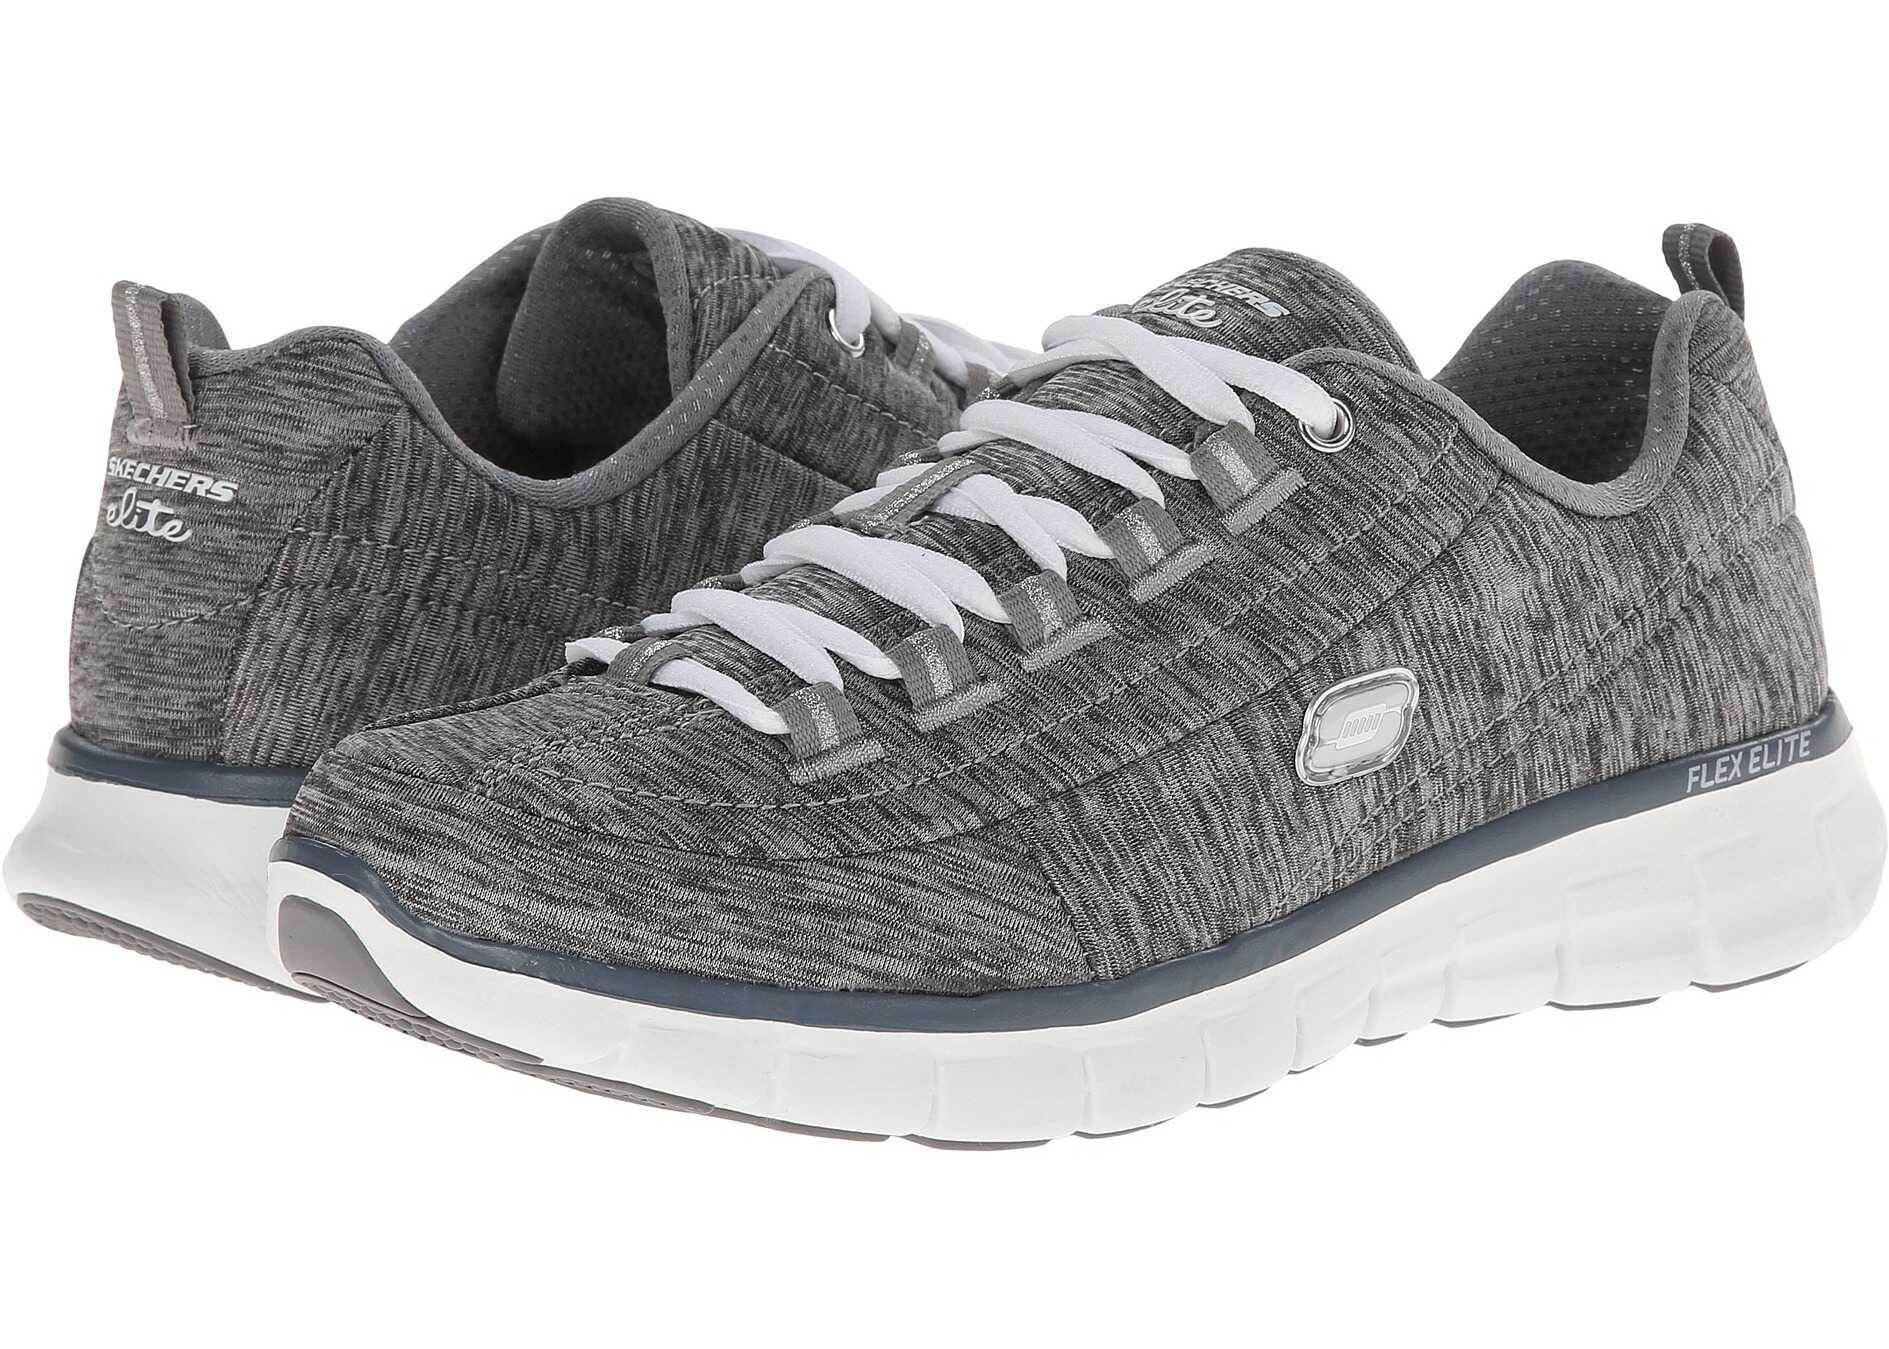 SKECHERS Spot On Gray